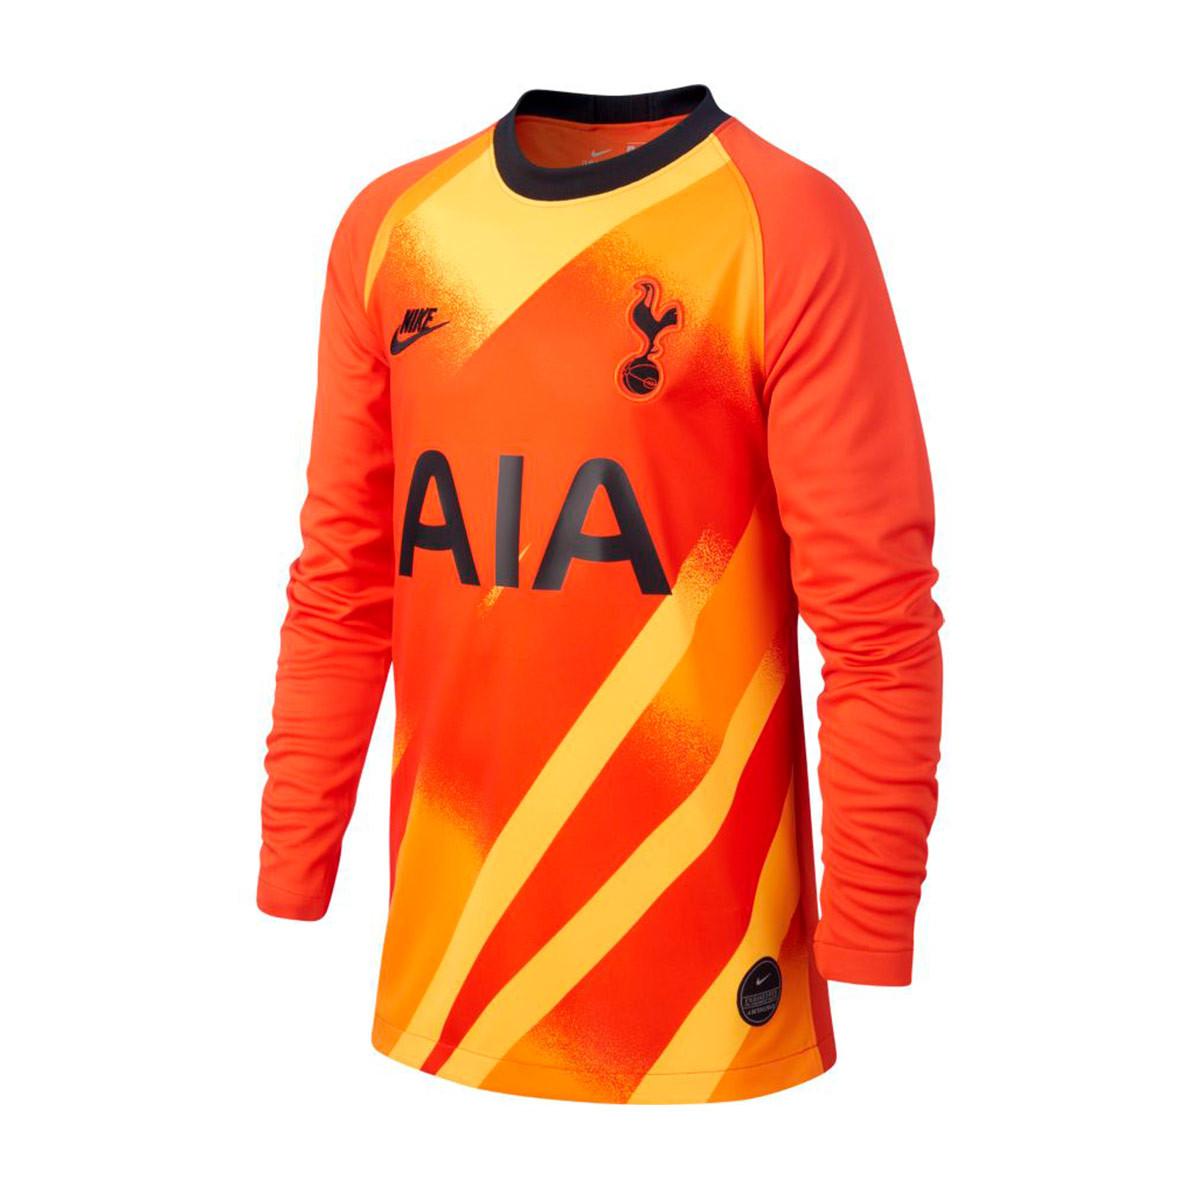 on sale 65a8e b781d Camiseta Tottenham Hotspur Breathe Stadium Portero 2019-2020 Niño Team  orange-Black